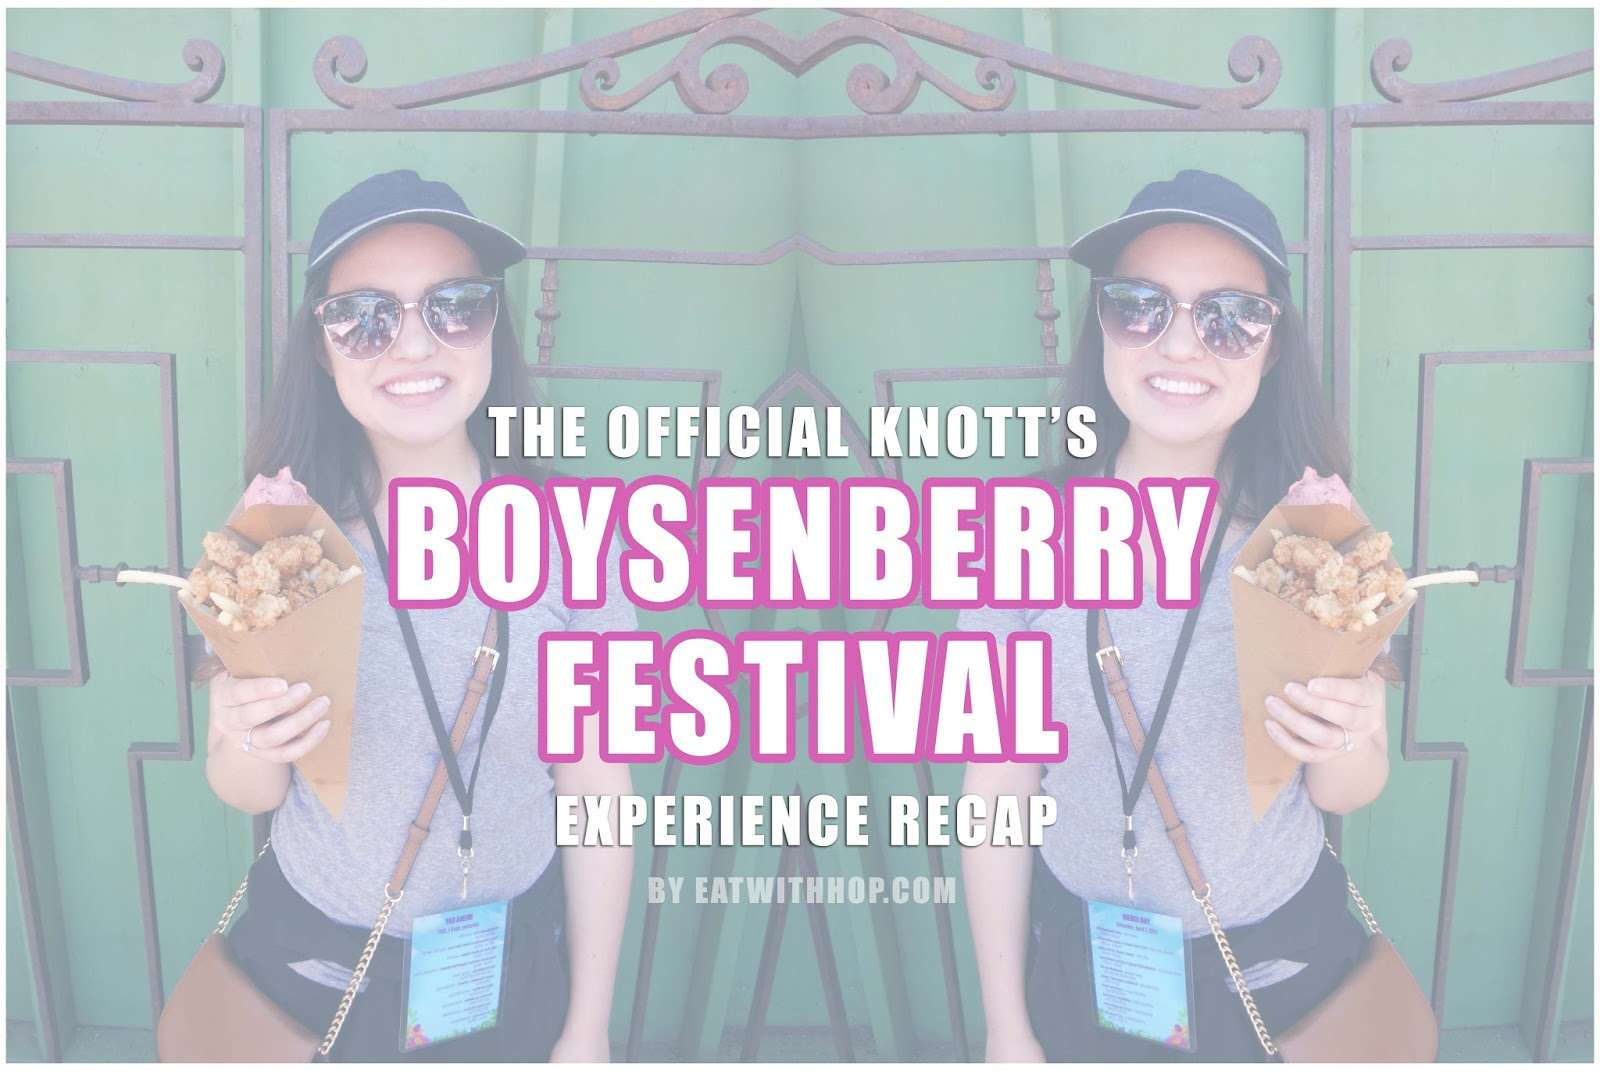 The Knott's Boysenberry Festival Experience Recap + Guide